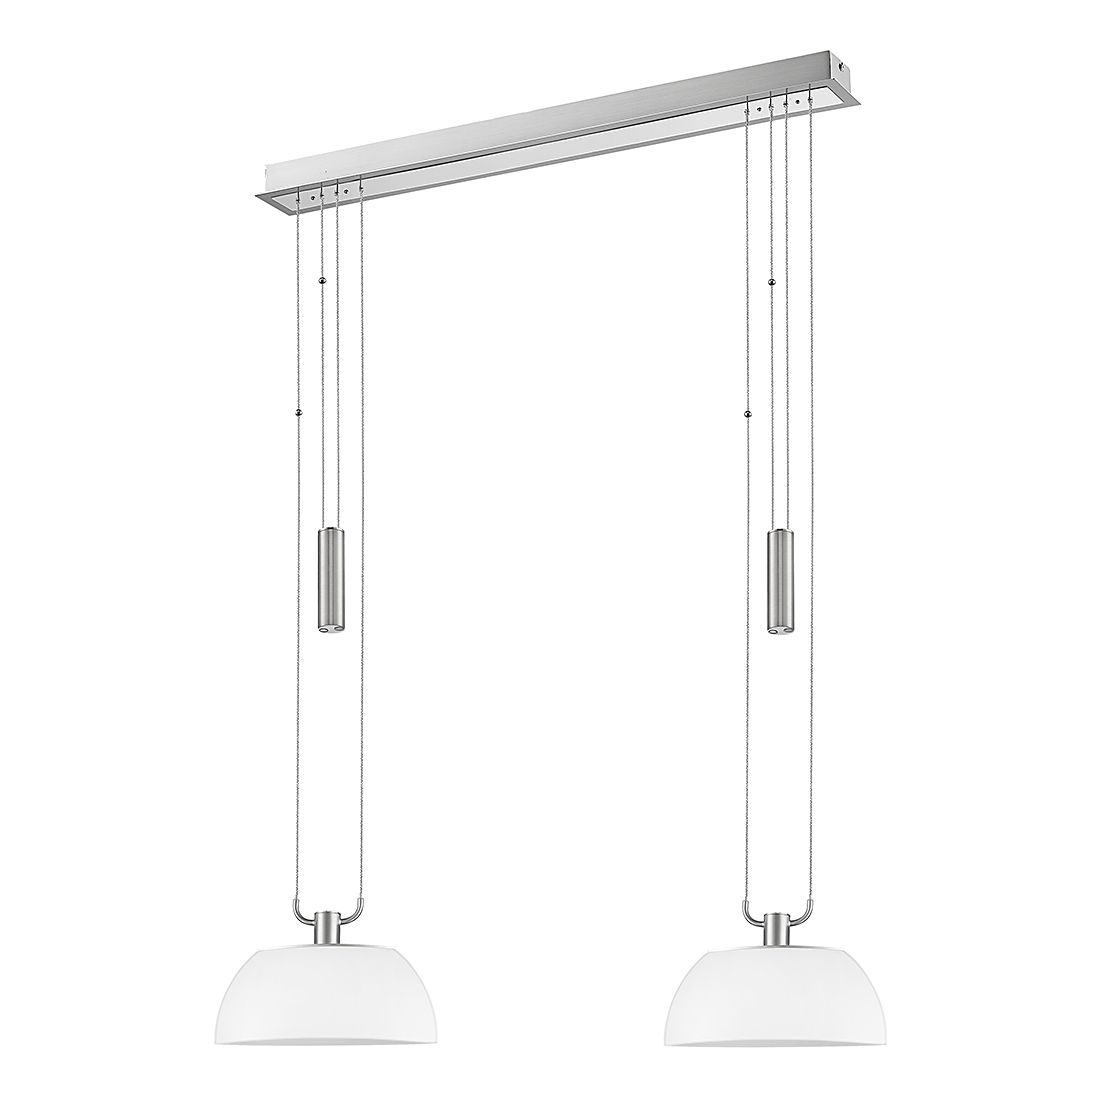 EEK A+, LED Pendelleuchte Ancona – Metall/Glas – 2-flammig, Sorpetaler günstig kaufen